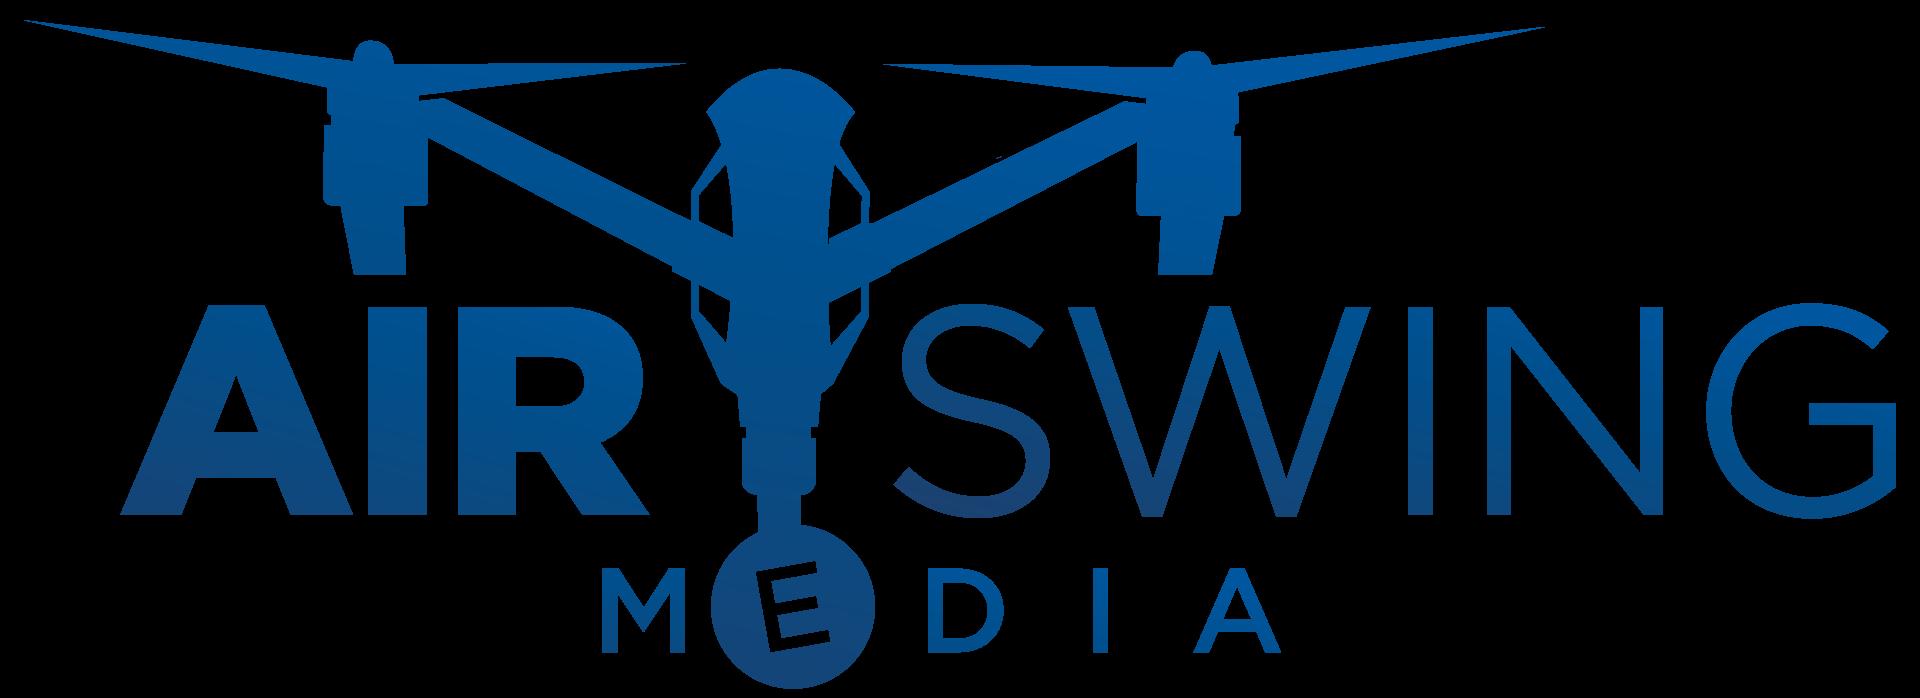 AirSwing Media